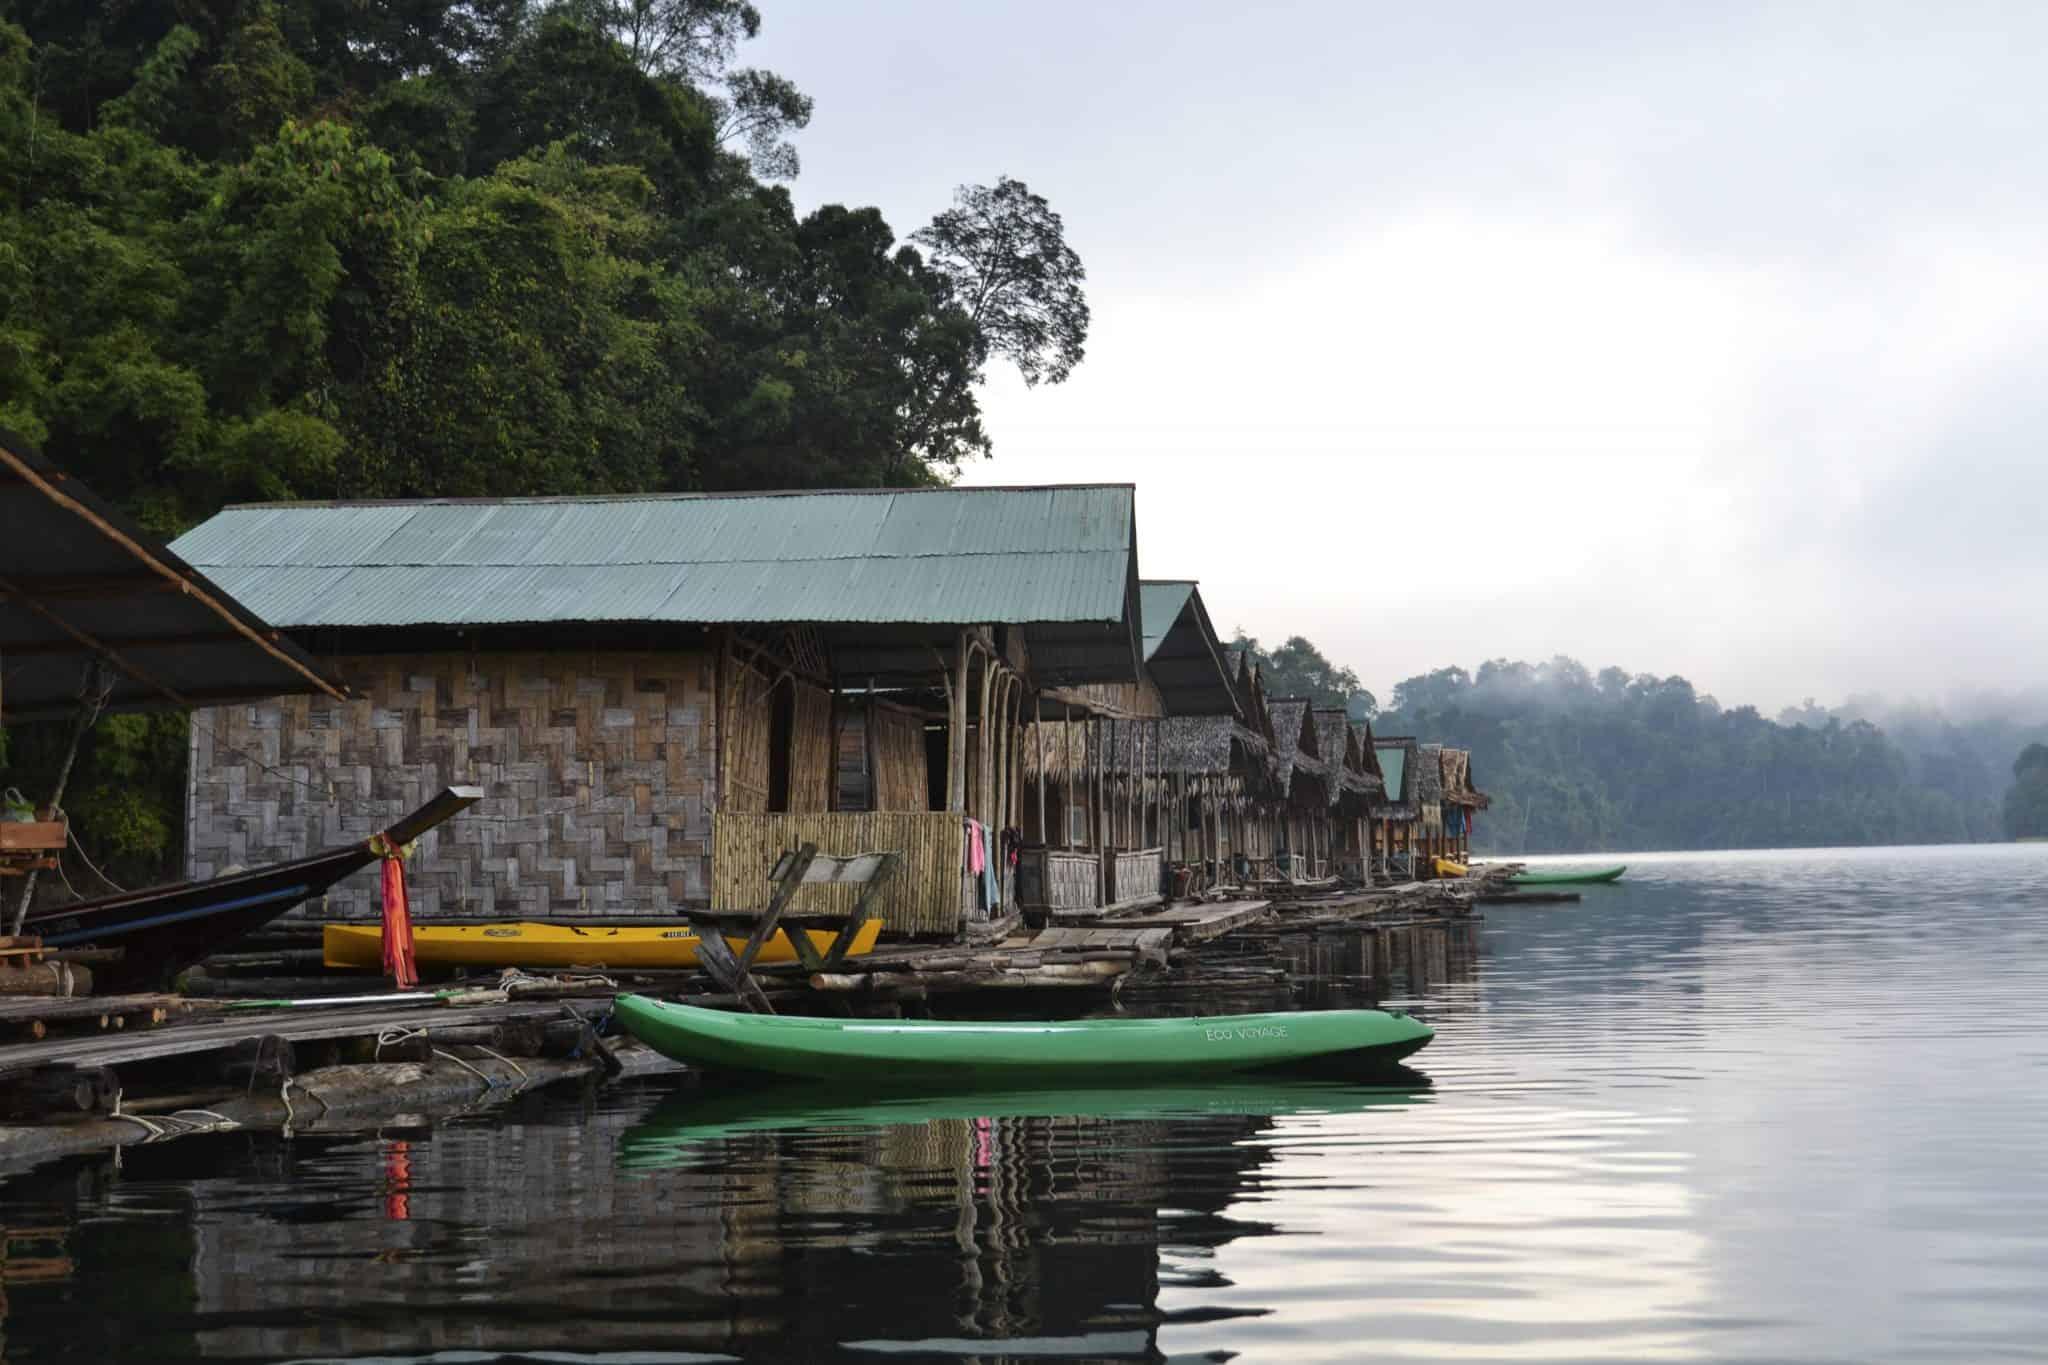 Bungalows flutuantes no lago